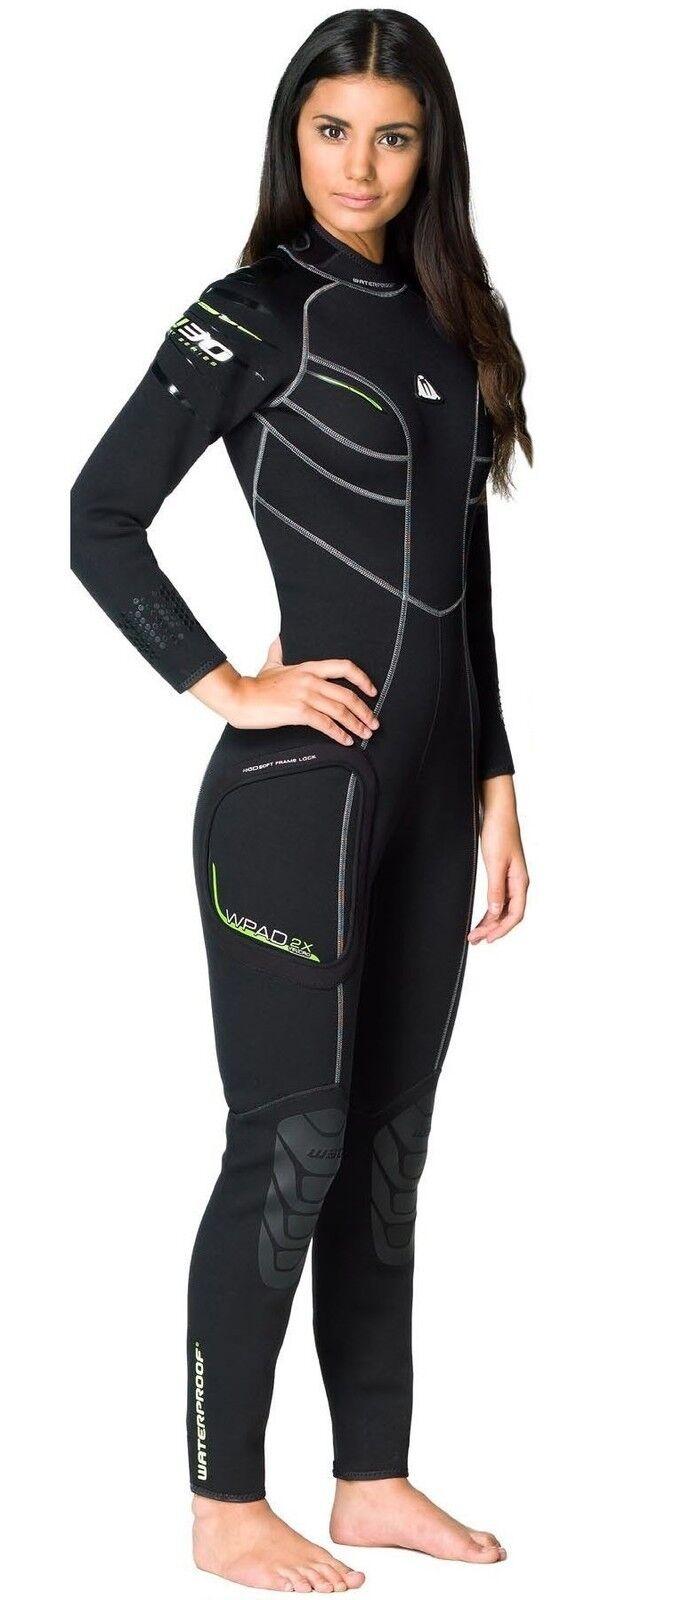 Waterproof W30 2,5 mm Combinaison Combinaison Tropical Femme, Neuf